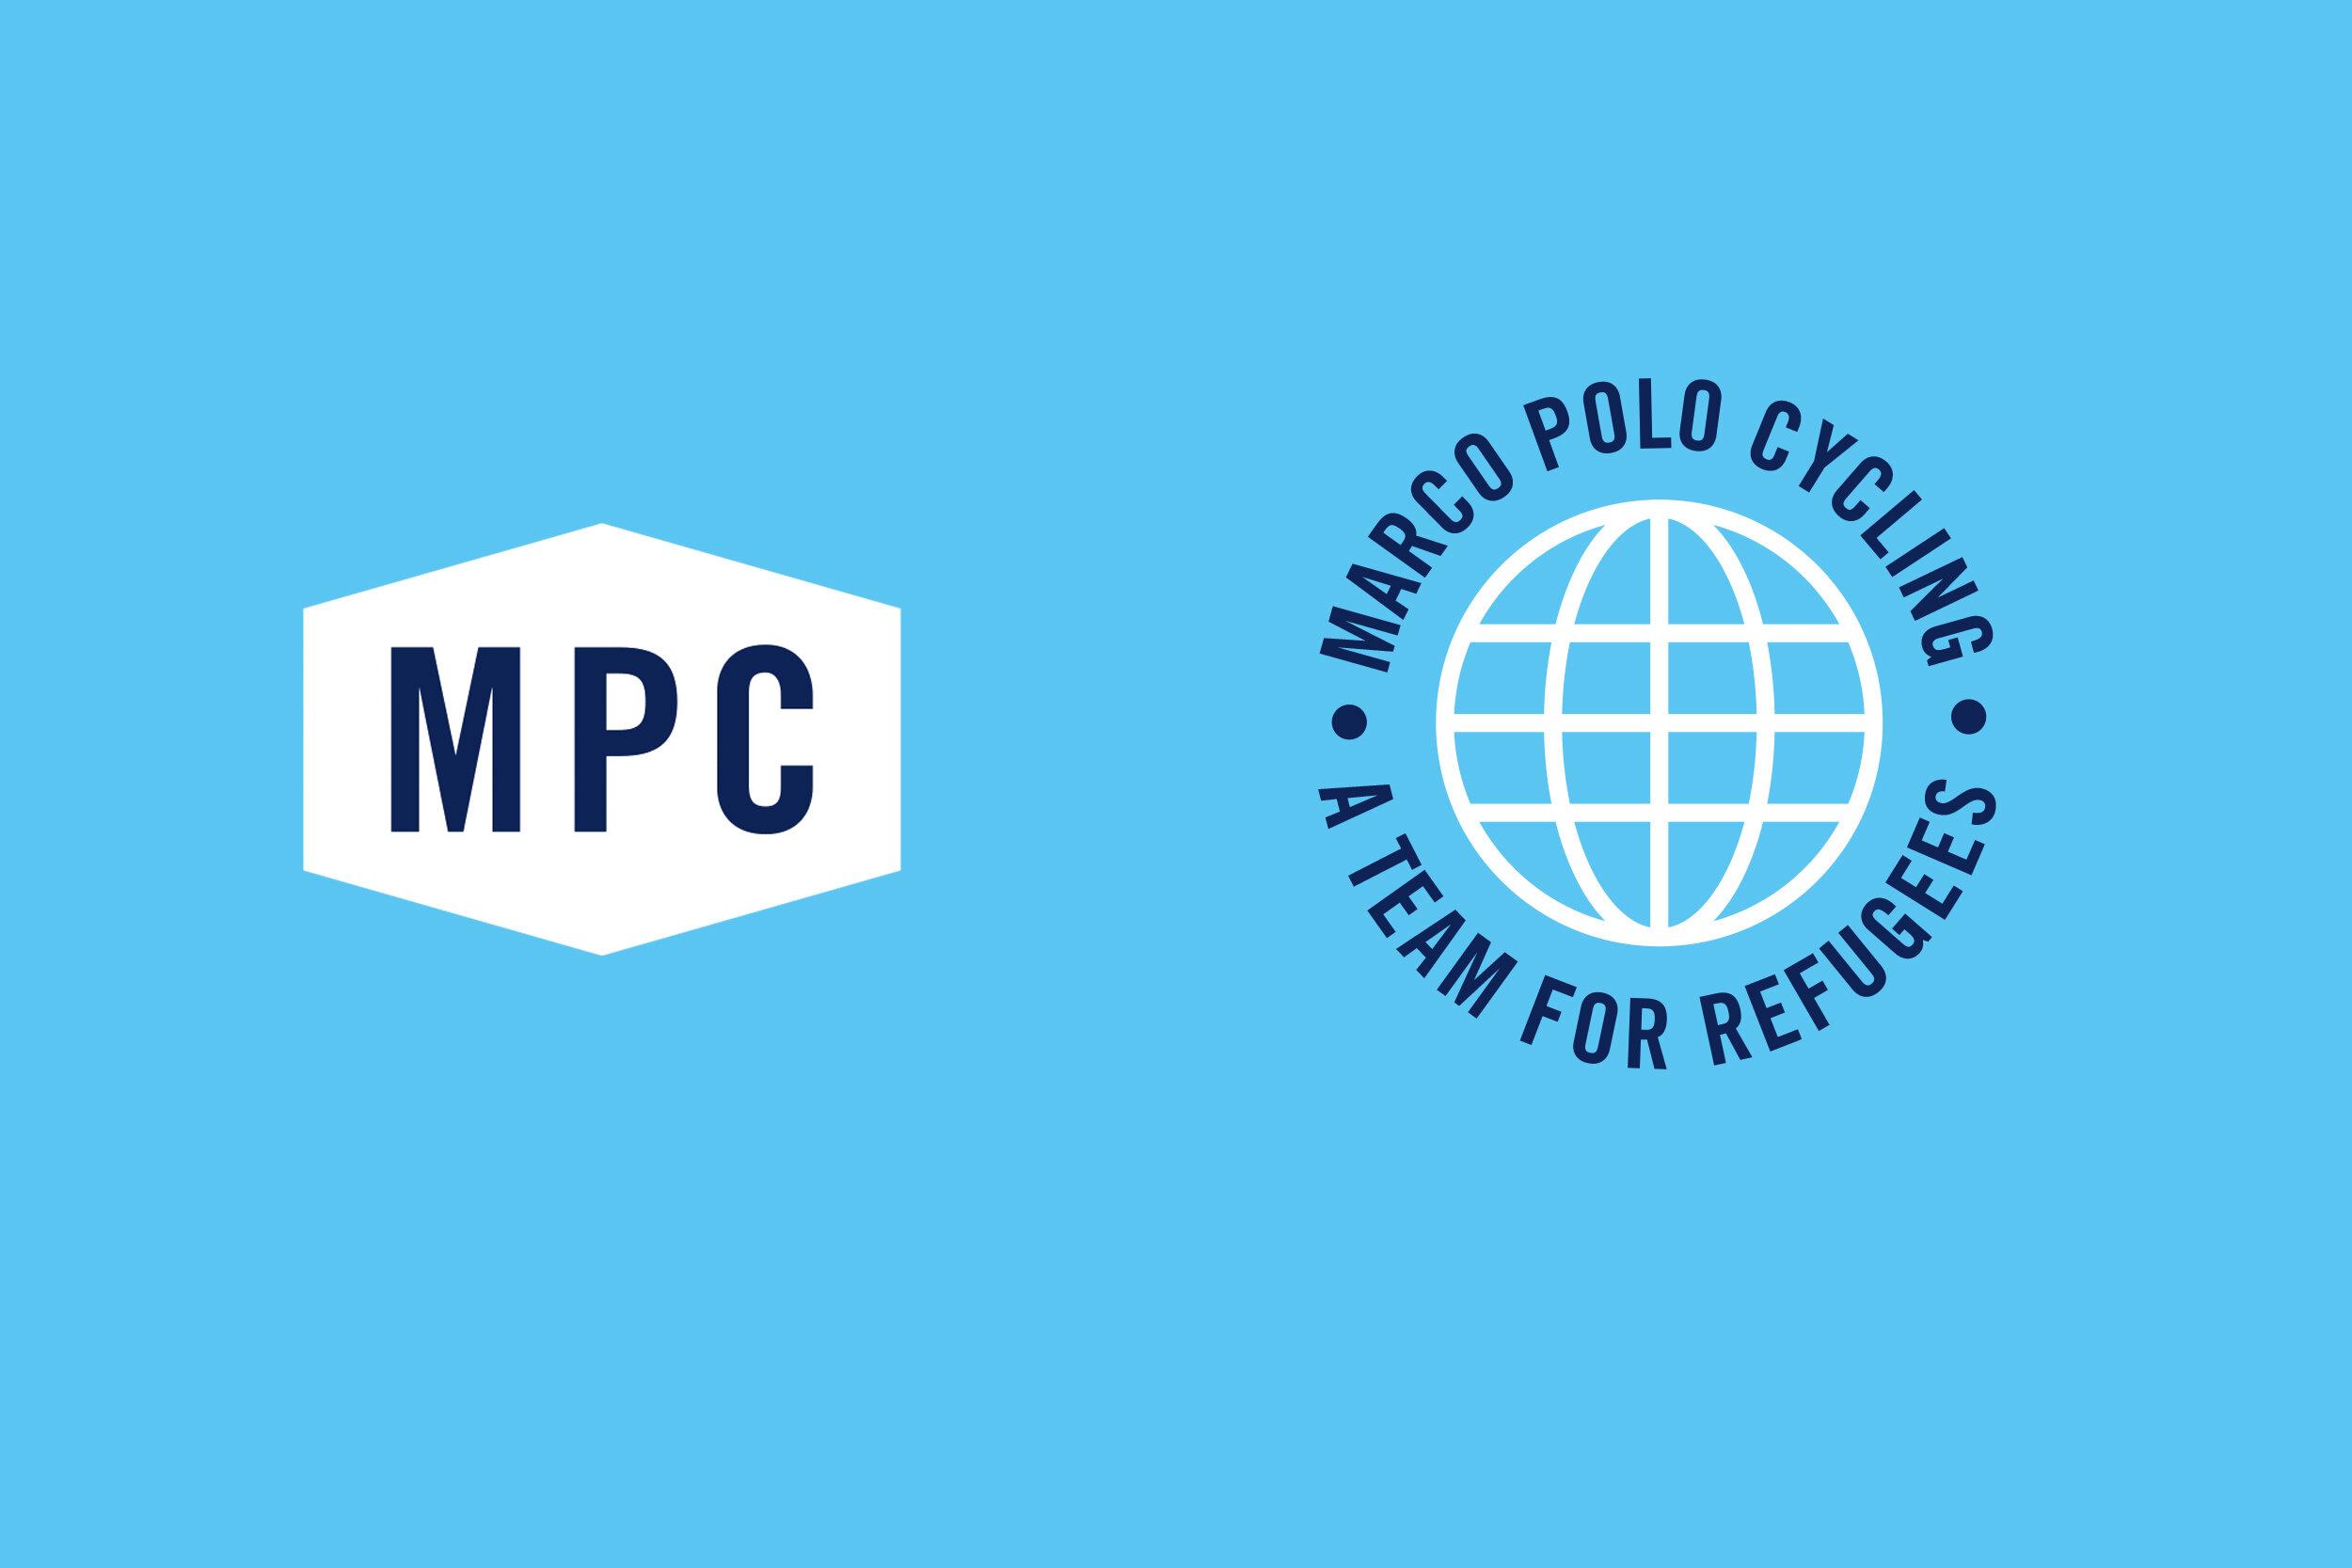 Logo_MarcoPoloCycling3_Shortlife.jpg